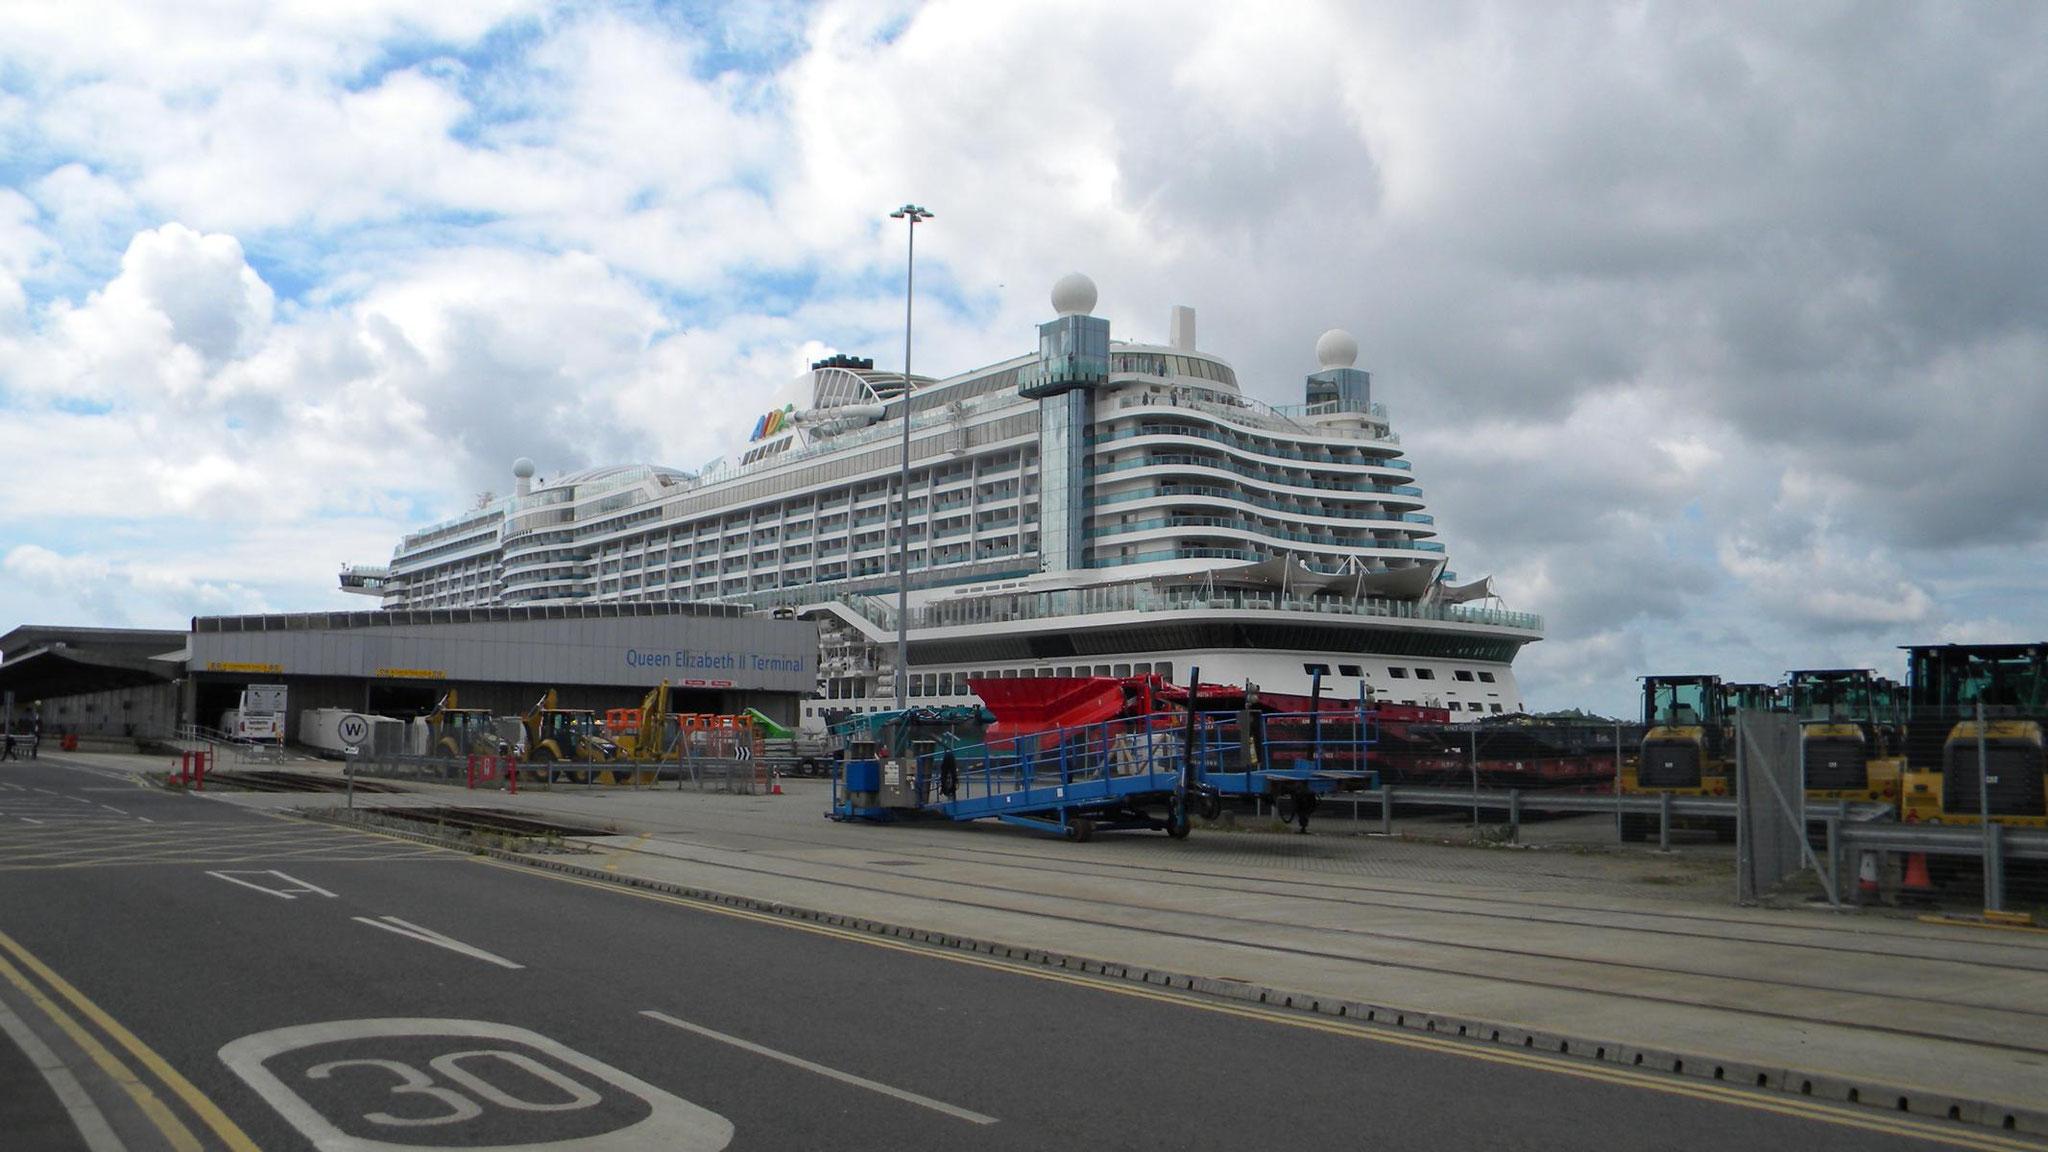 AIDAperla am QEII Cruise Terminal